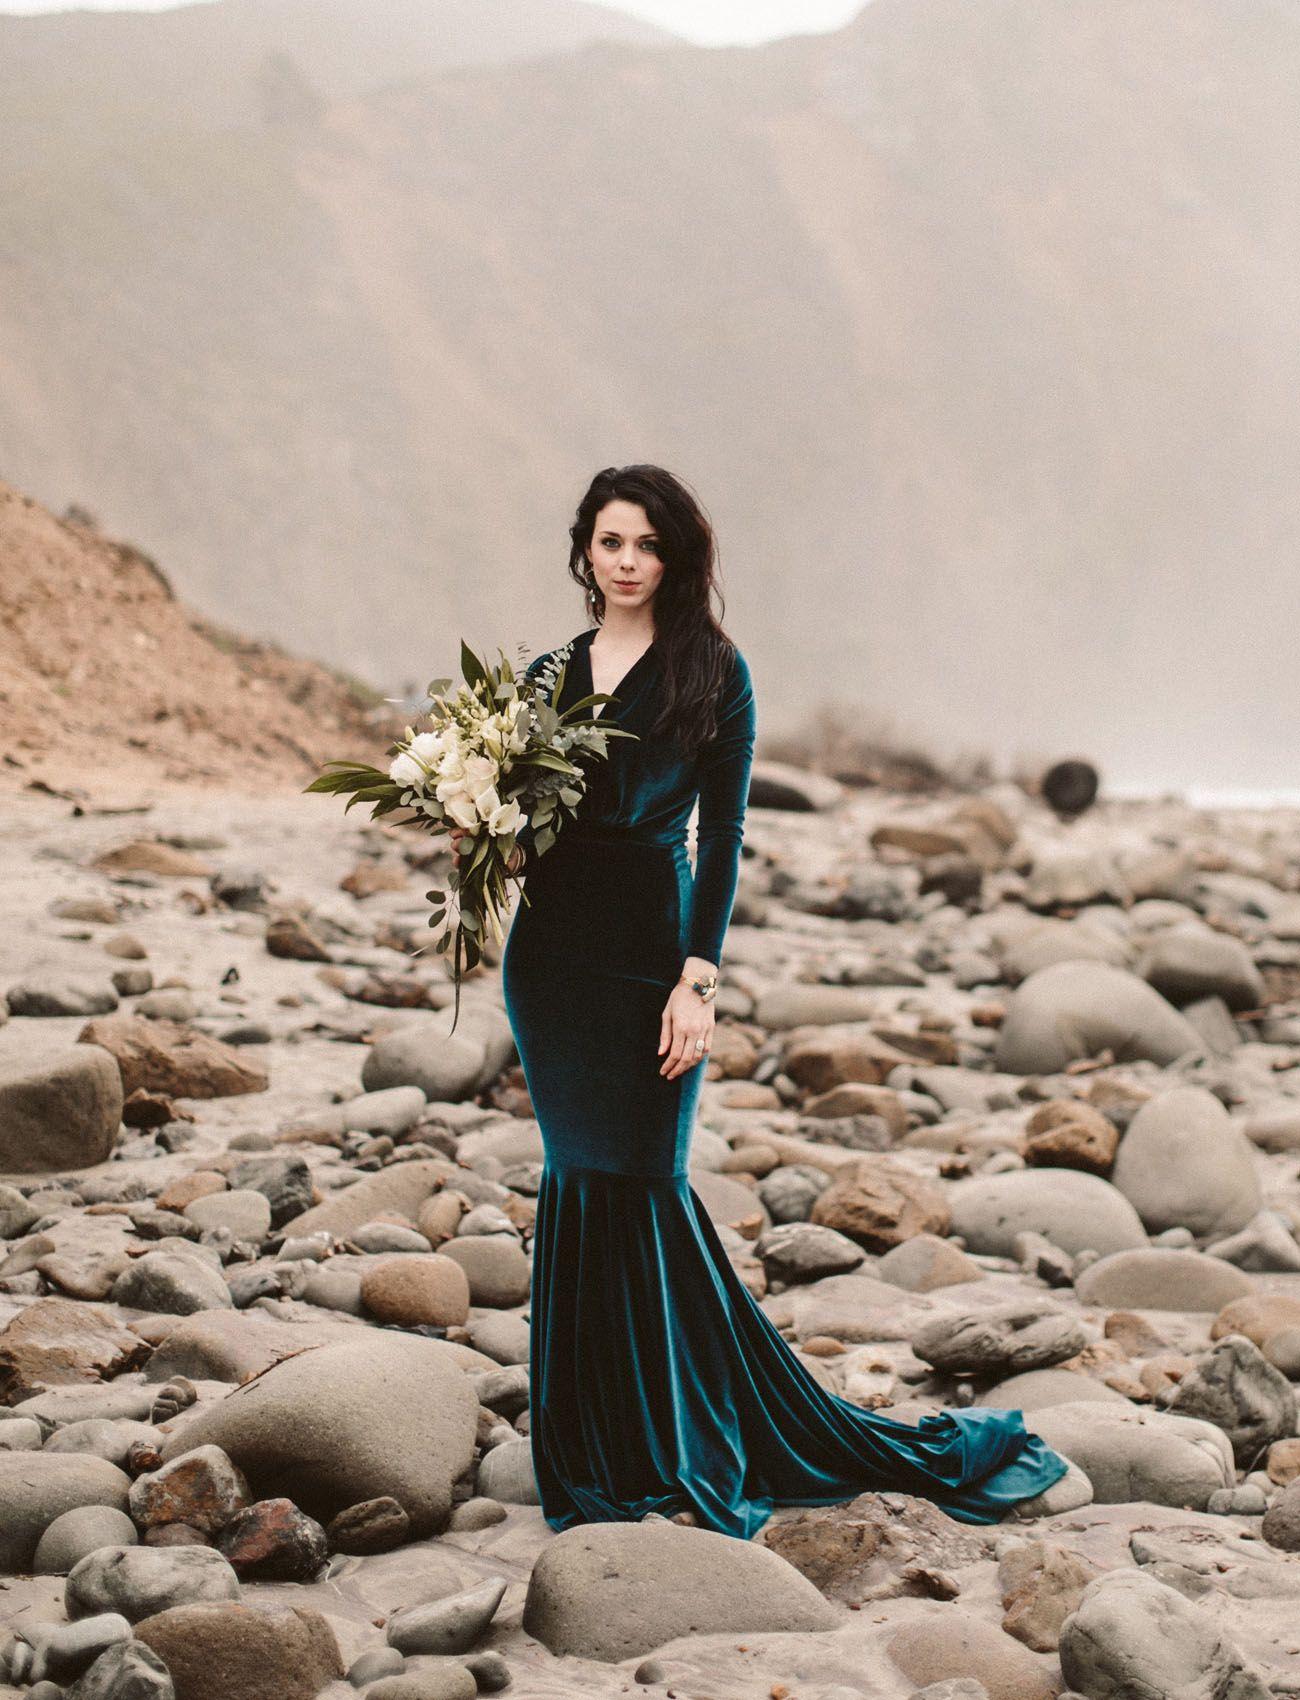 The bride wore a teal velvet wedding dress in this big sur elopement